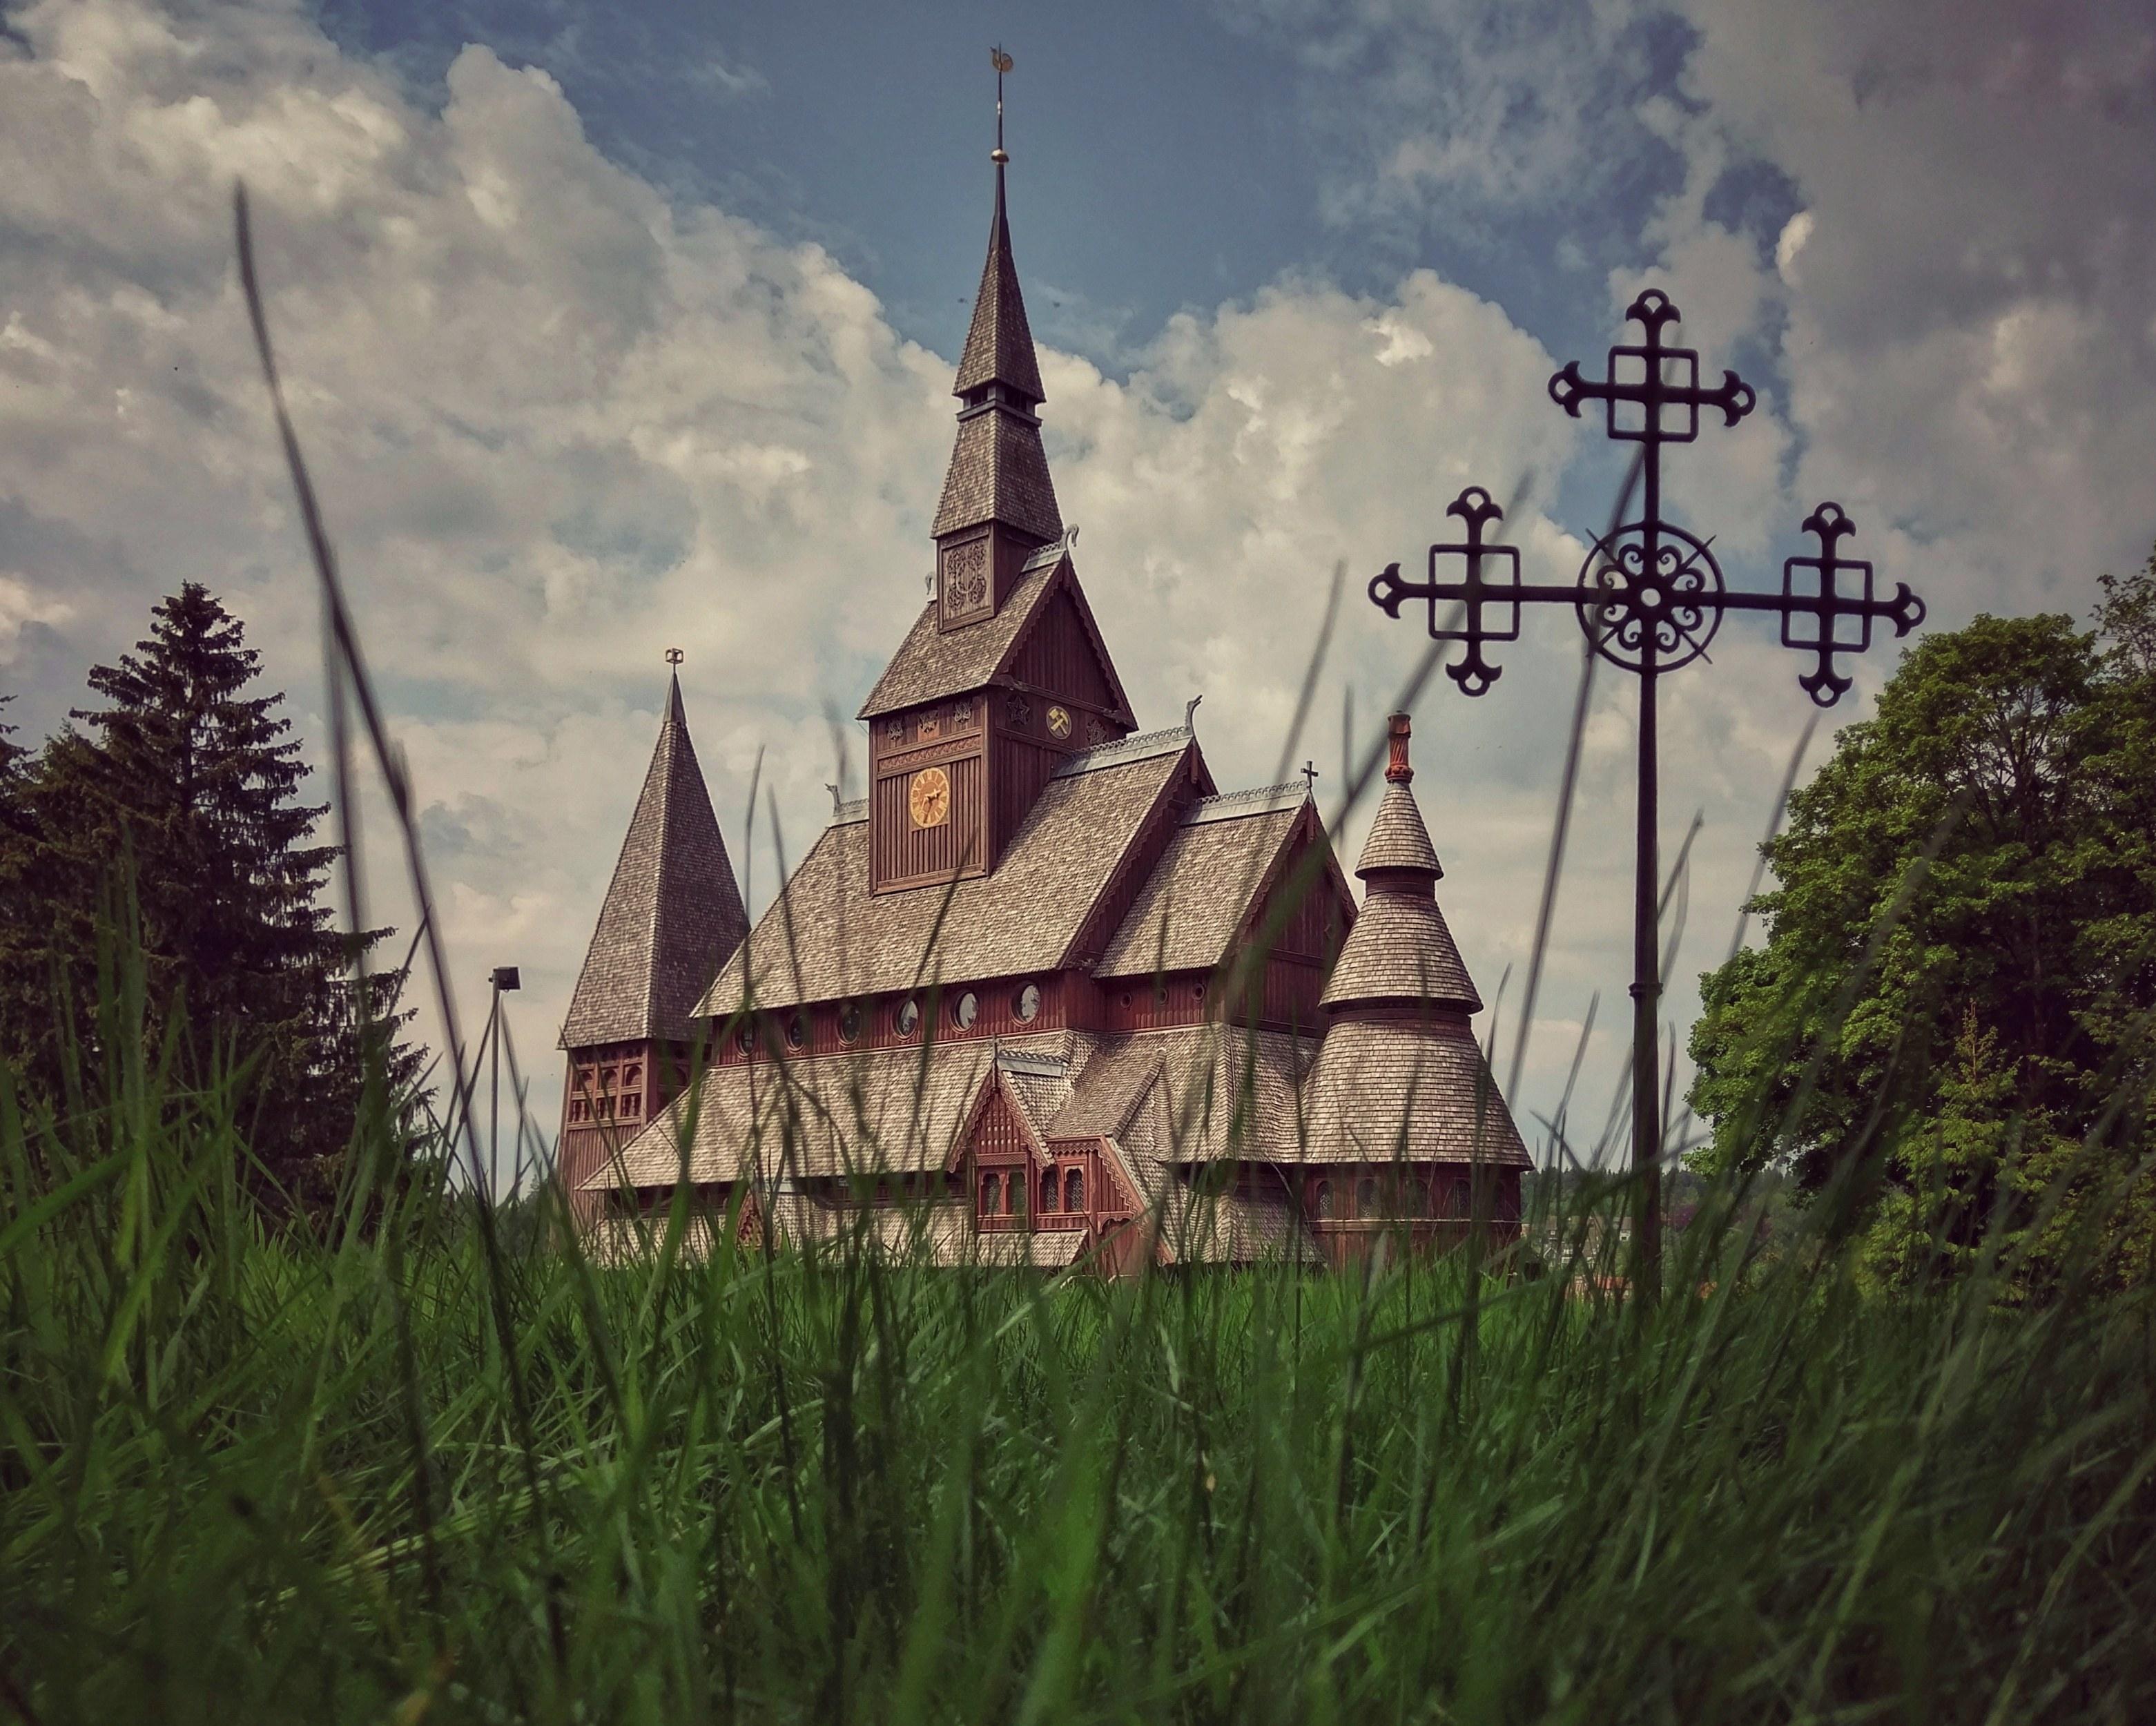 Kirchengarten